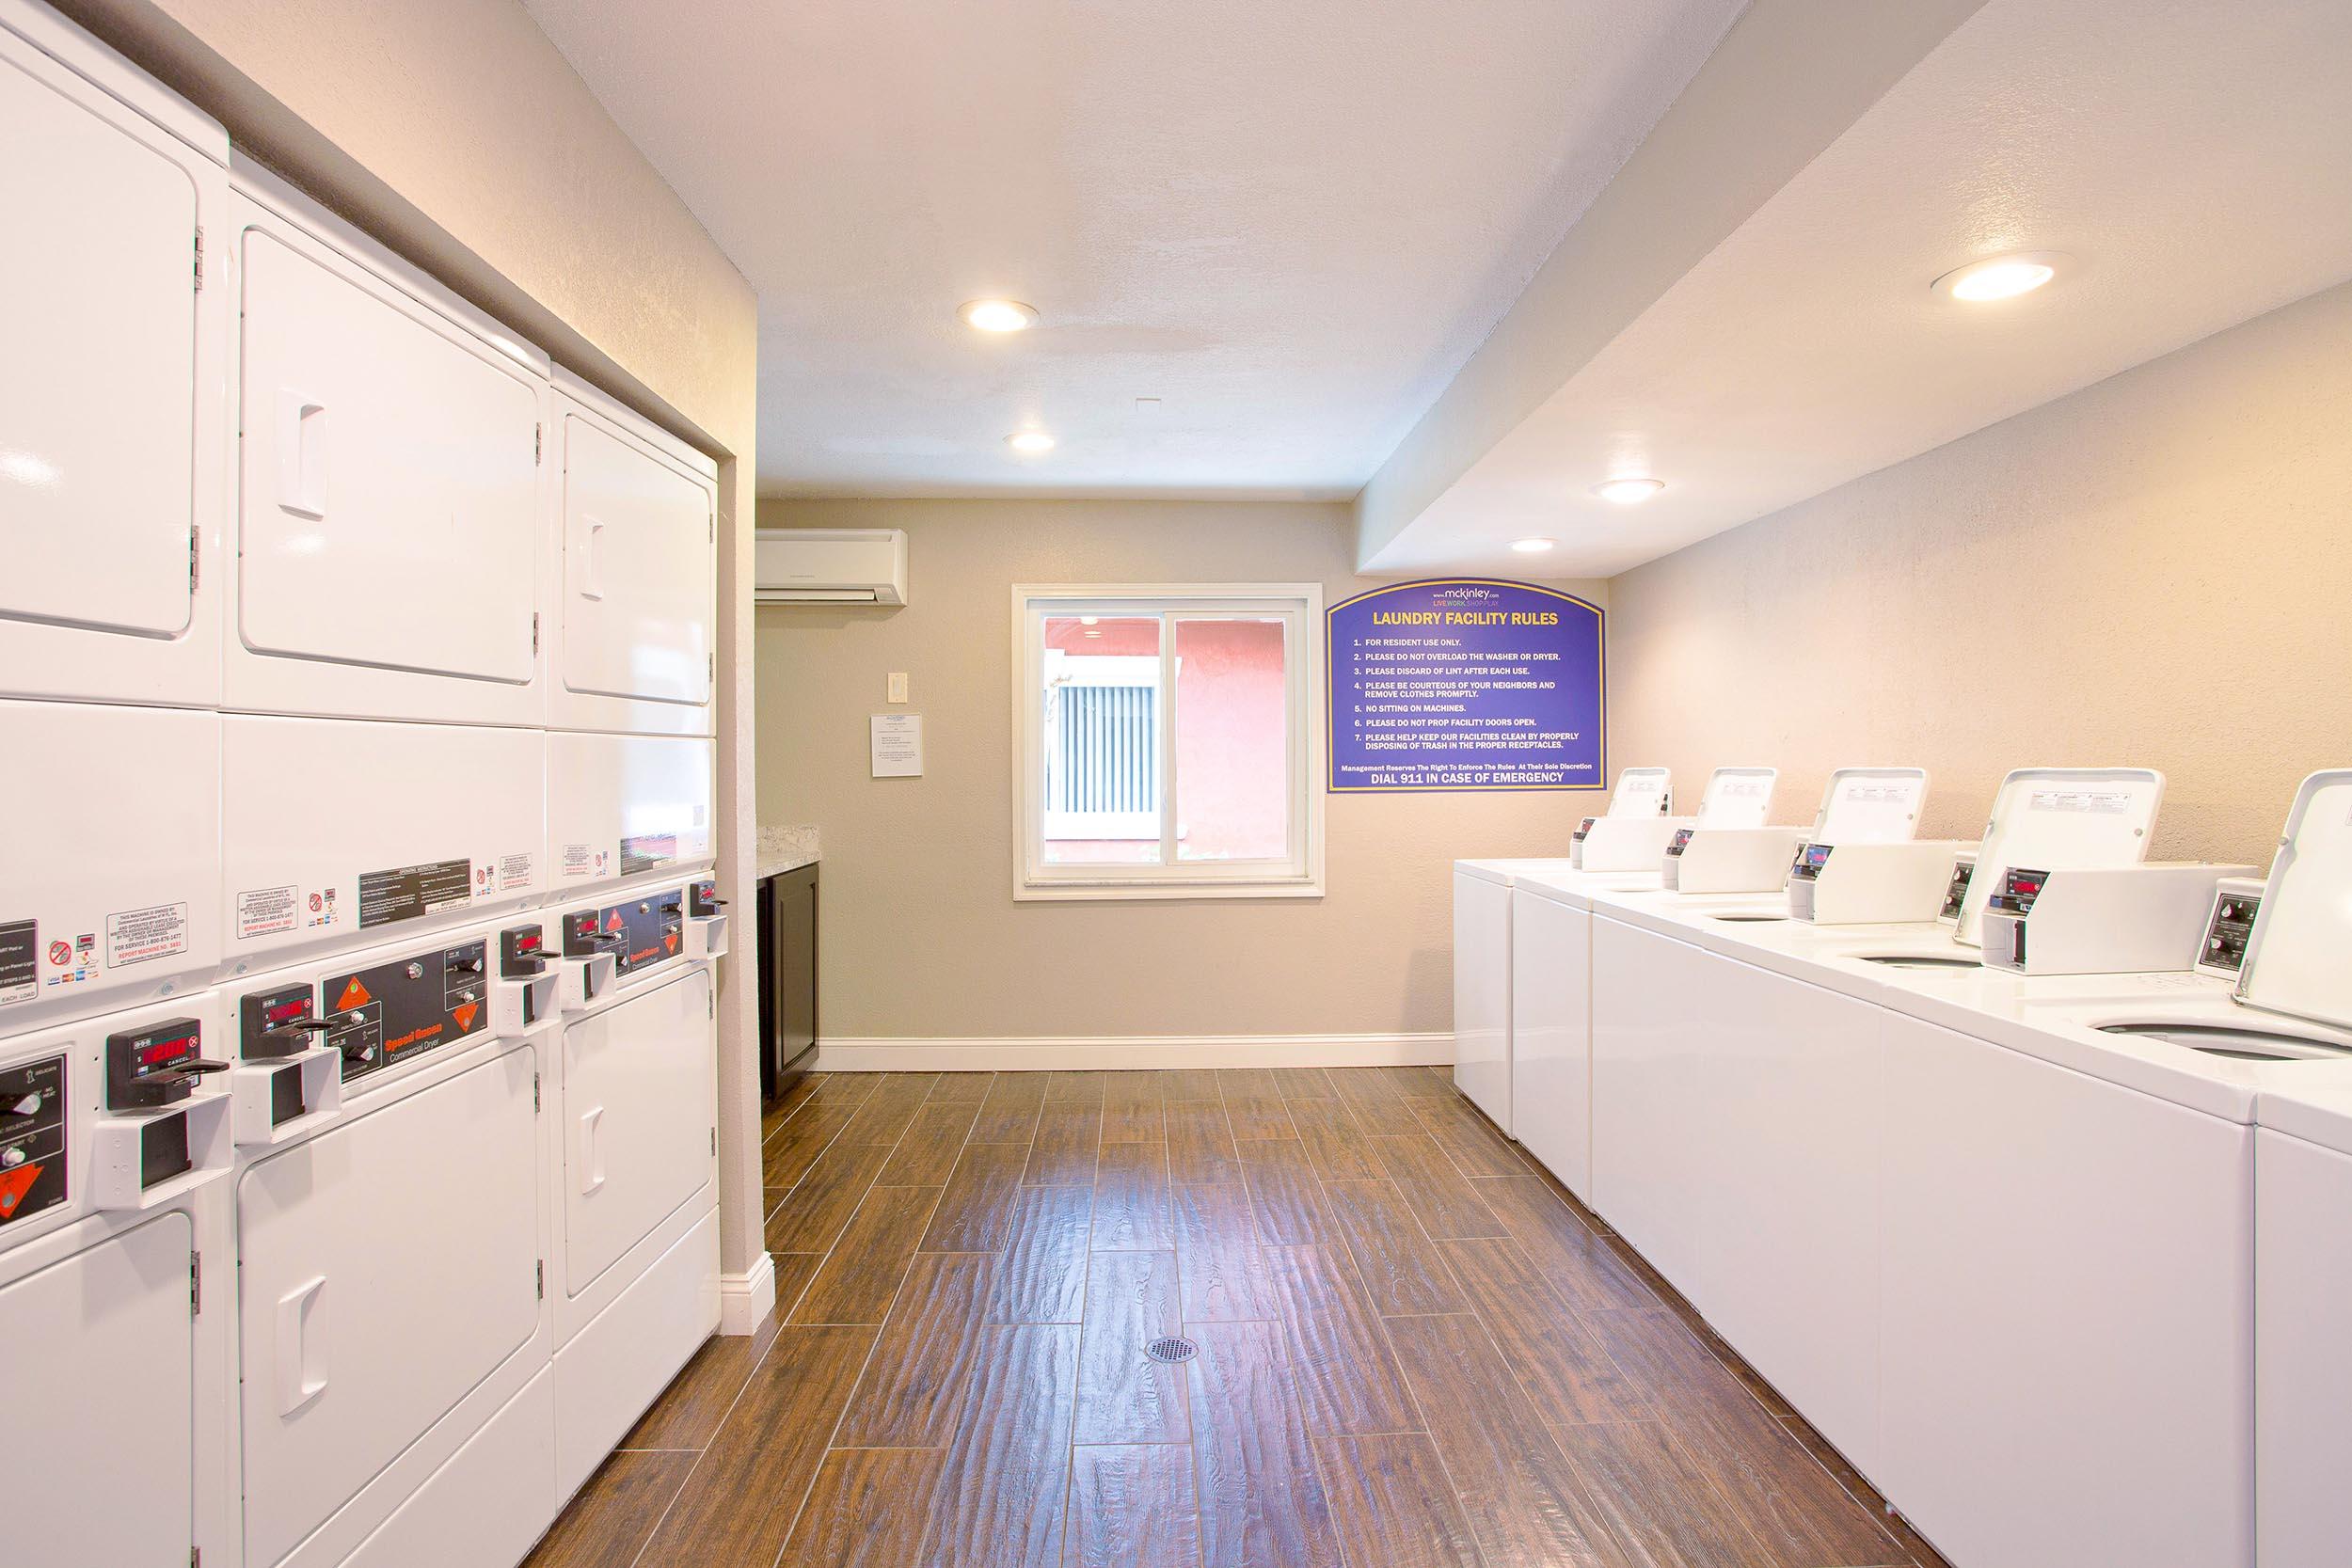 Ml-20laundry-20room-2